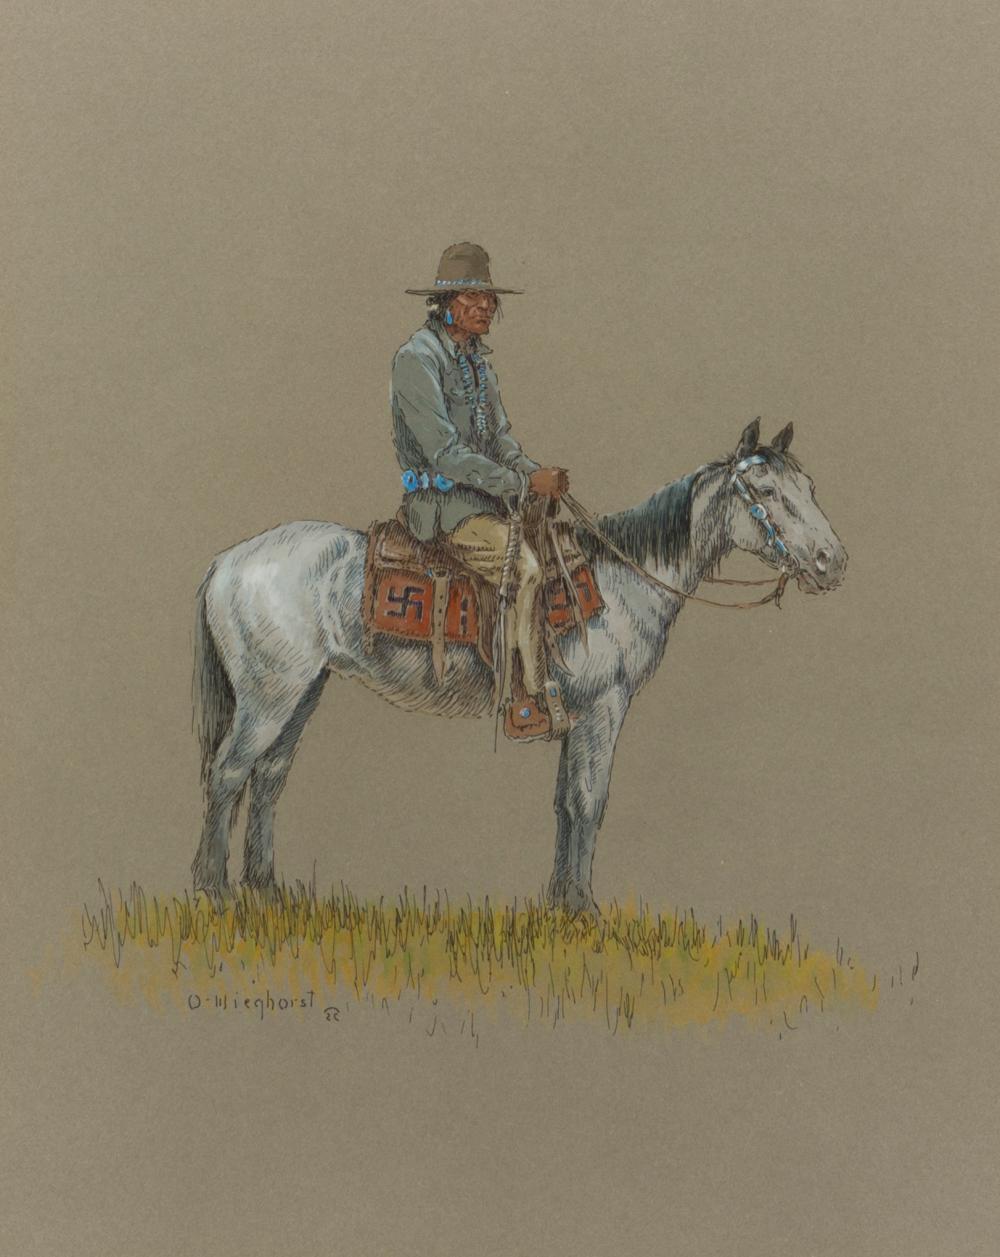 "Olaf Wieghorst, (1899-1988 El Cajon, CA), American Indian on horseback, Gouache and ink on board under glass, Sight: 13"" H x 10.75"" W"